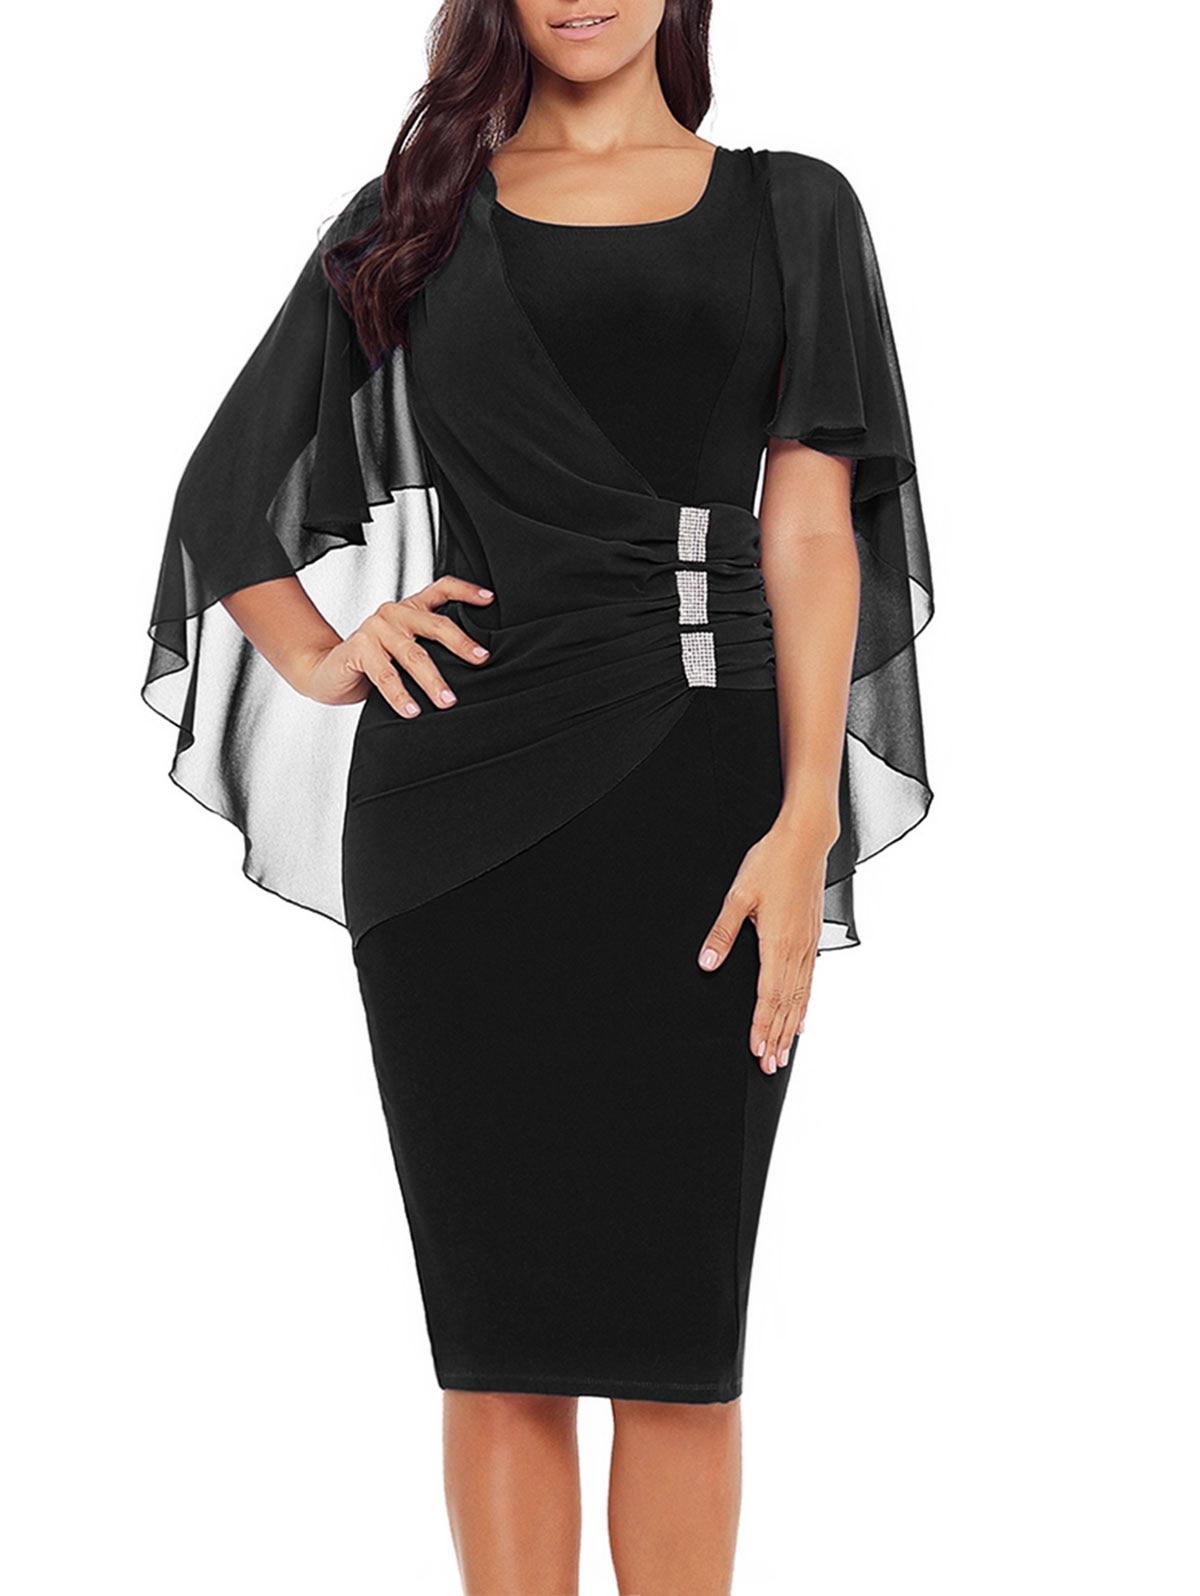 Detail Feedback Questions about Wipalo Women Office Dresses 2018 ... 983a9196ddf2